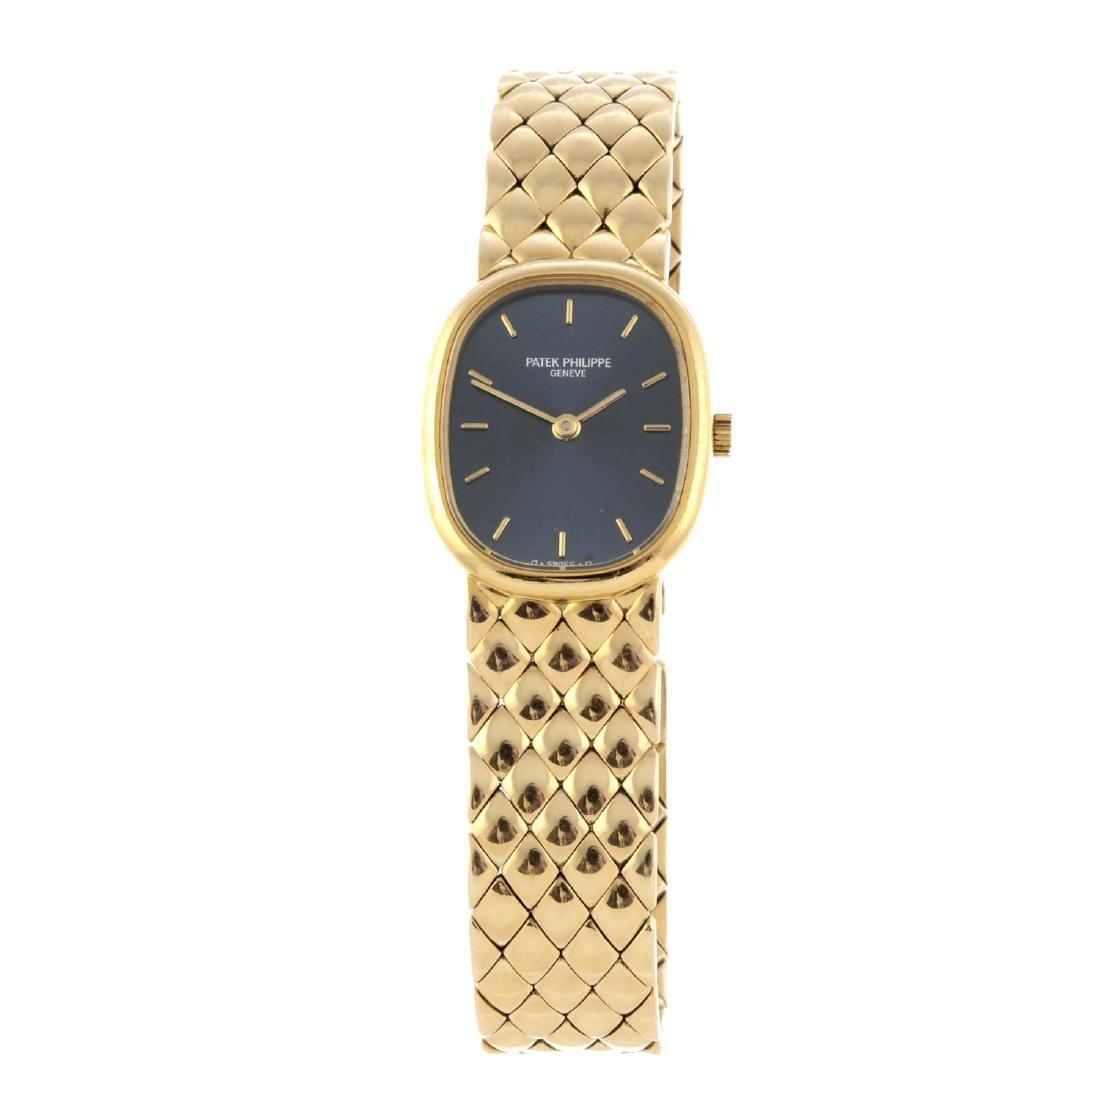 PATEK PHILIPPE - a lady's Ellipse bracelet watch. 18ct